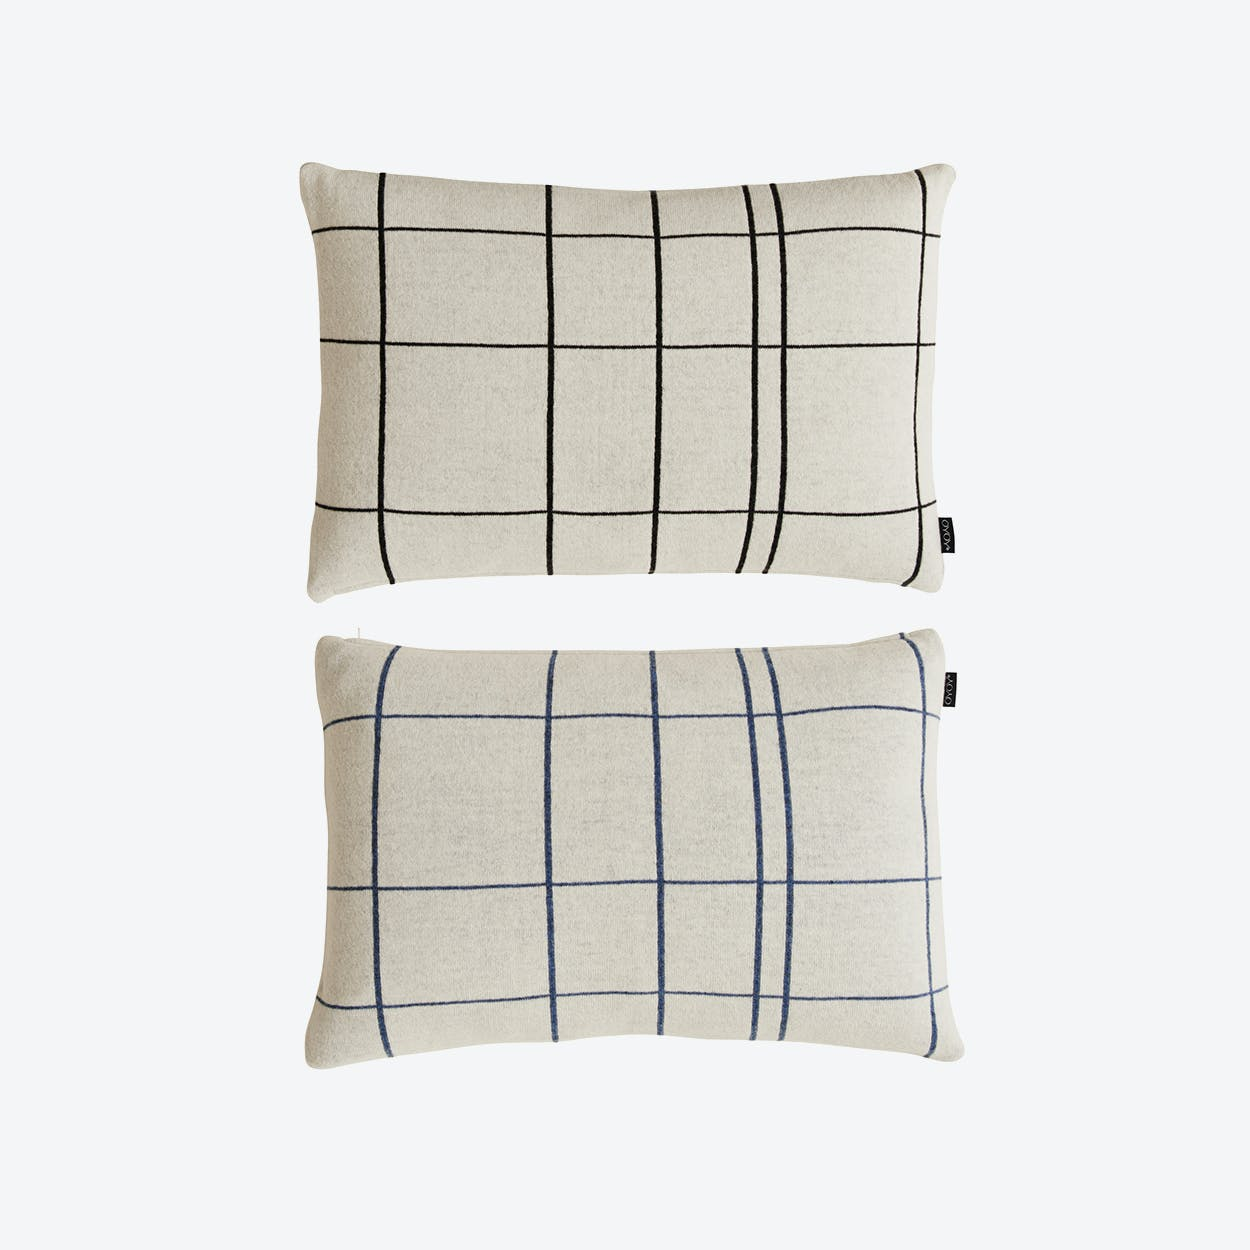 Square Cushion in White/Black & White/Blue